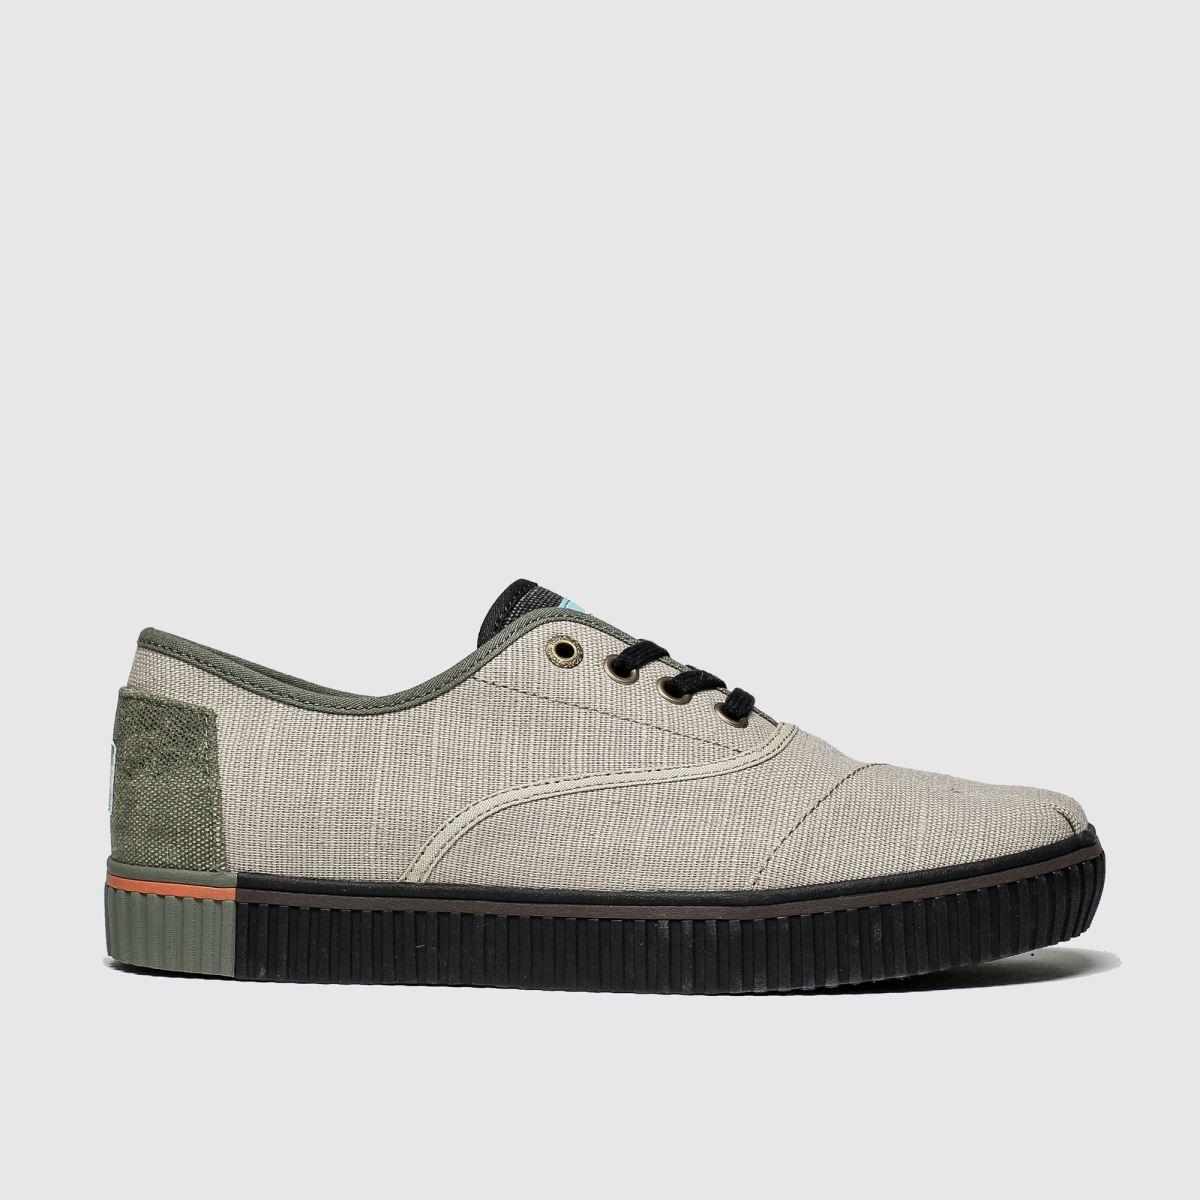 Toms Stone Cordones Indio Shoes